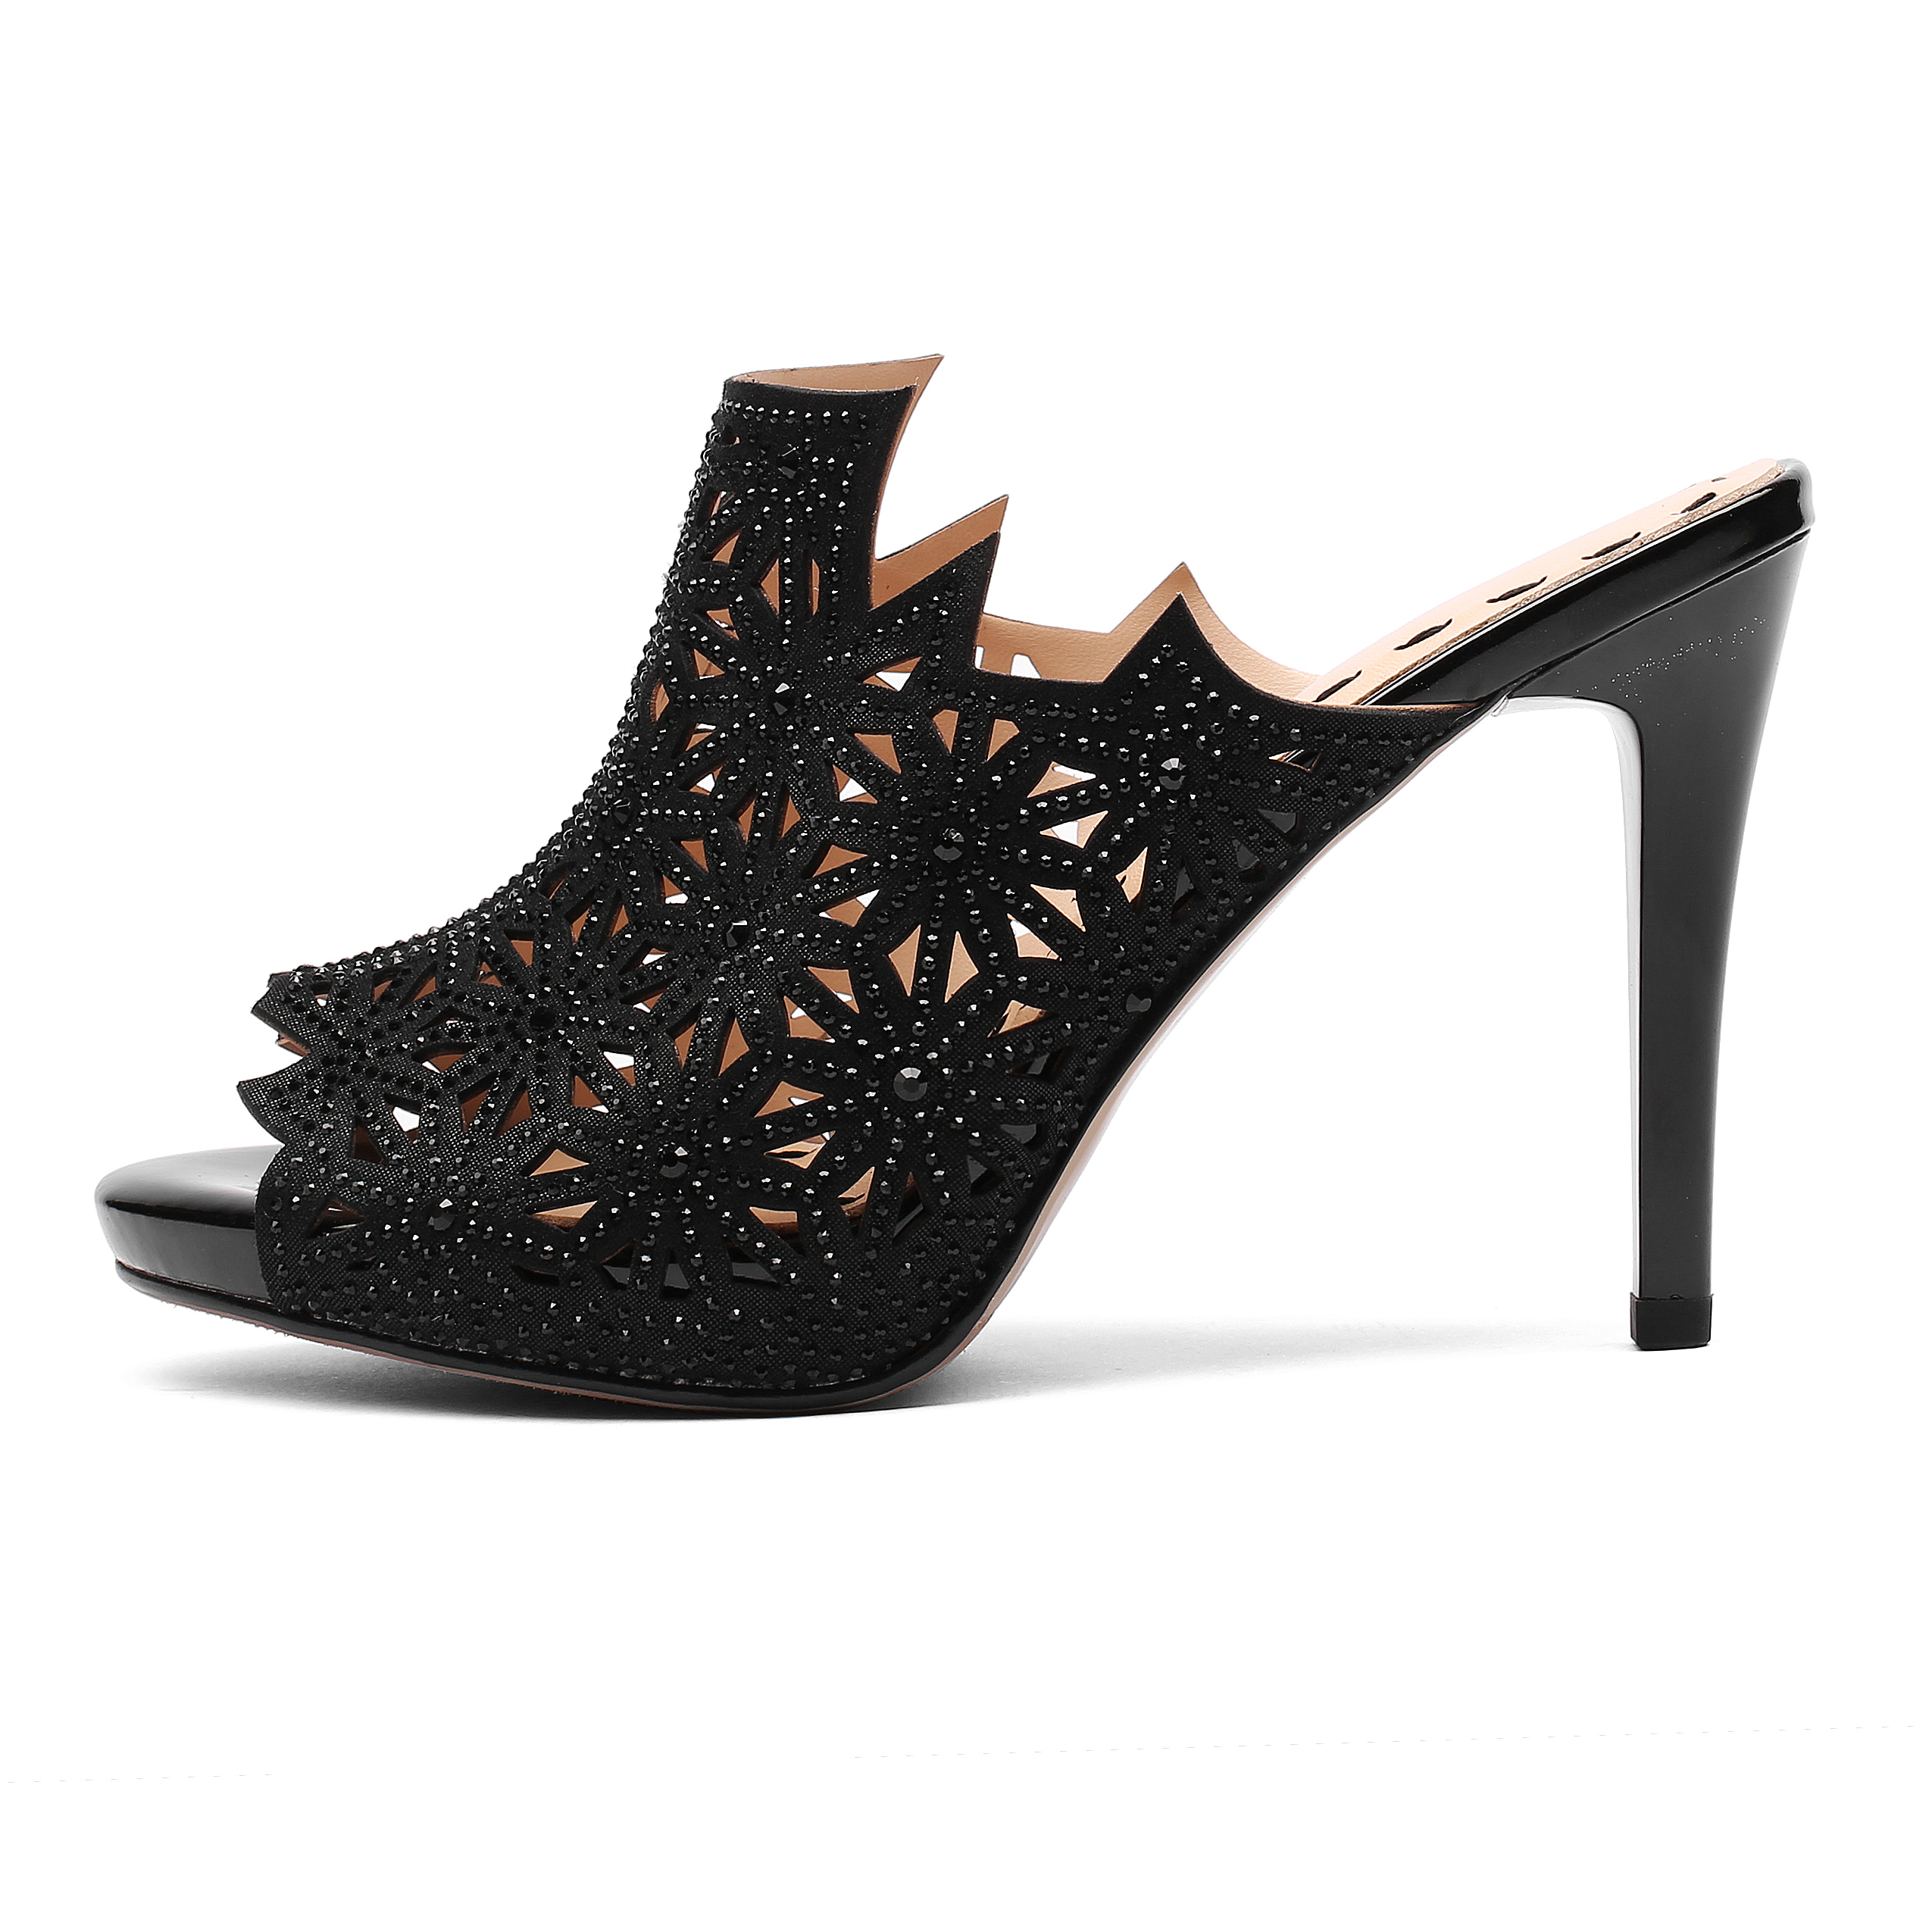 36bcfbc4c US  53 - 2018 summer high heels 9cm platform peep toe size 33 fretwork  evening party shoes mules - www.ardenfurtado.com